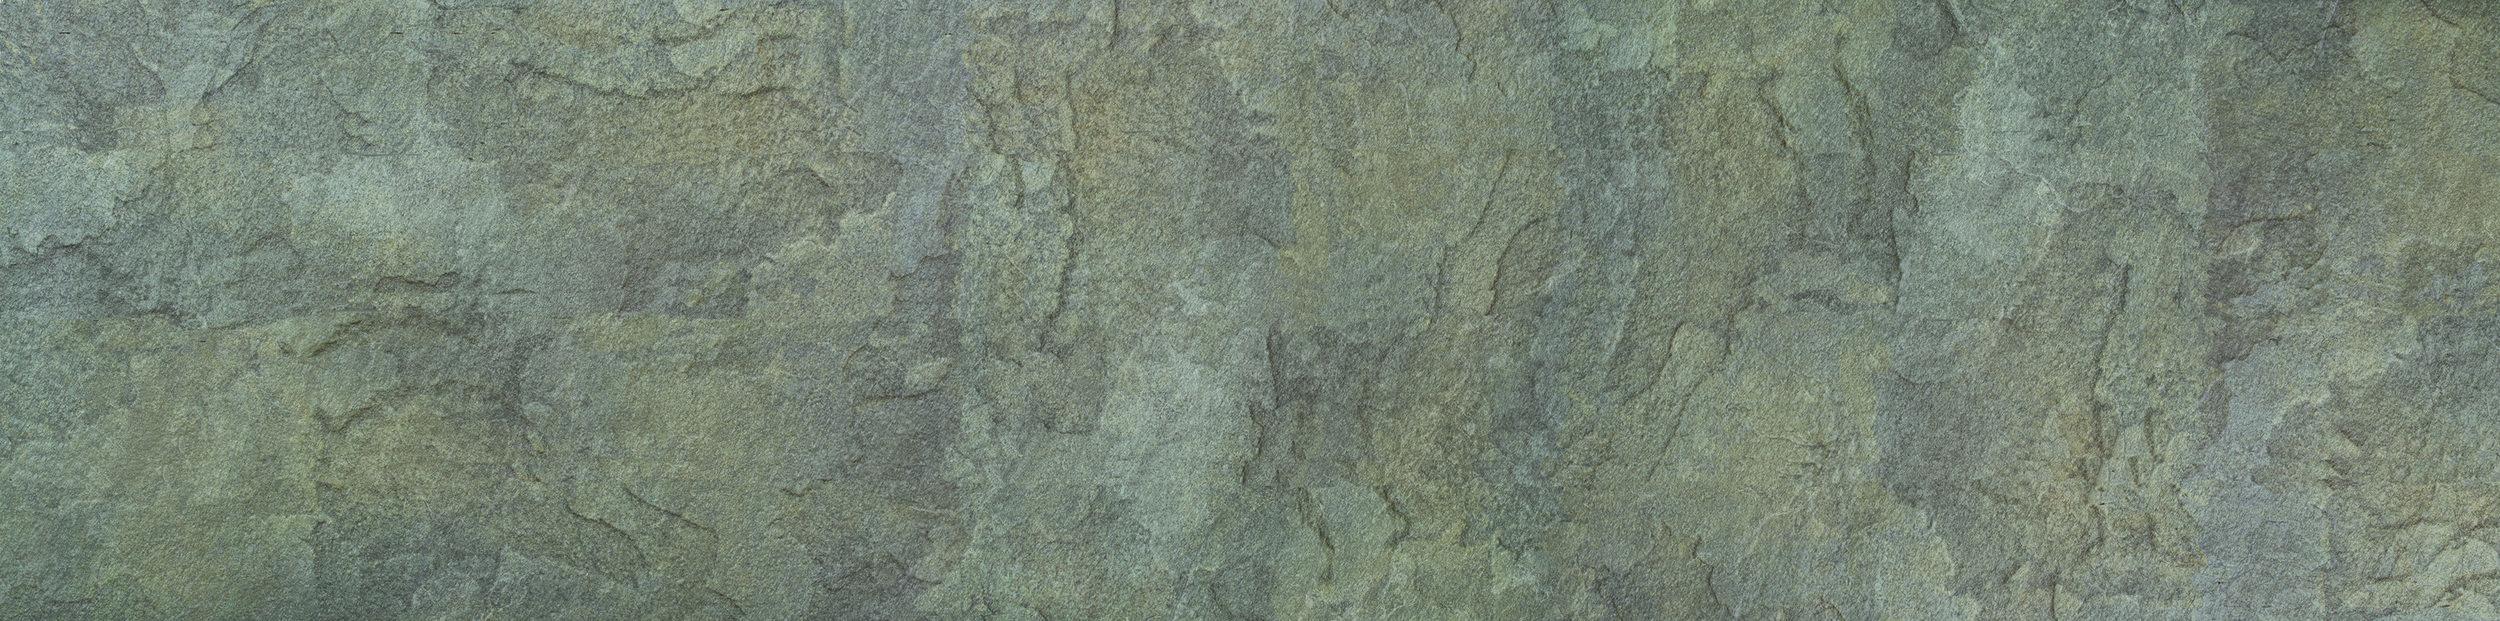 Slate warmtonewaltex panel.jpg